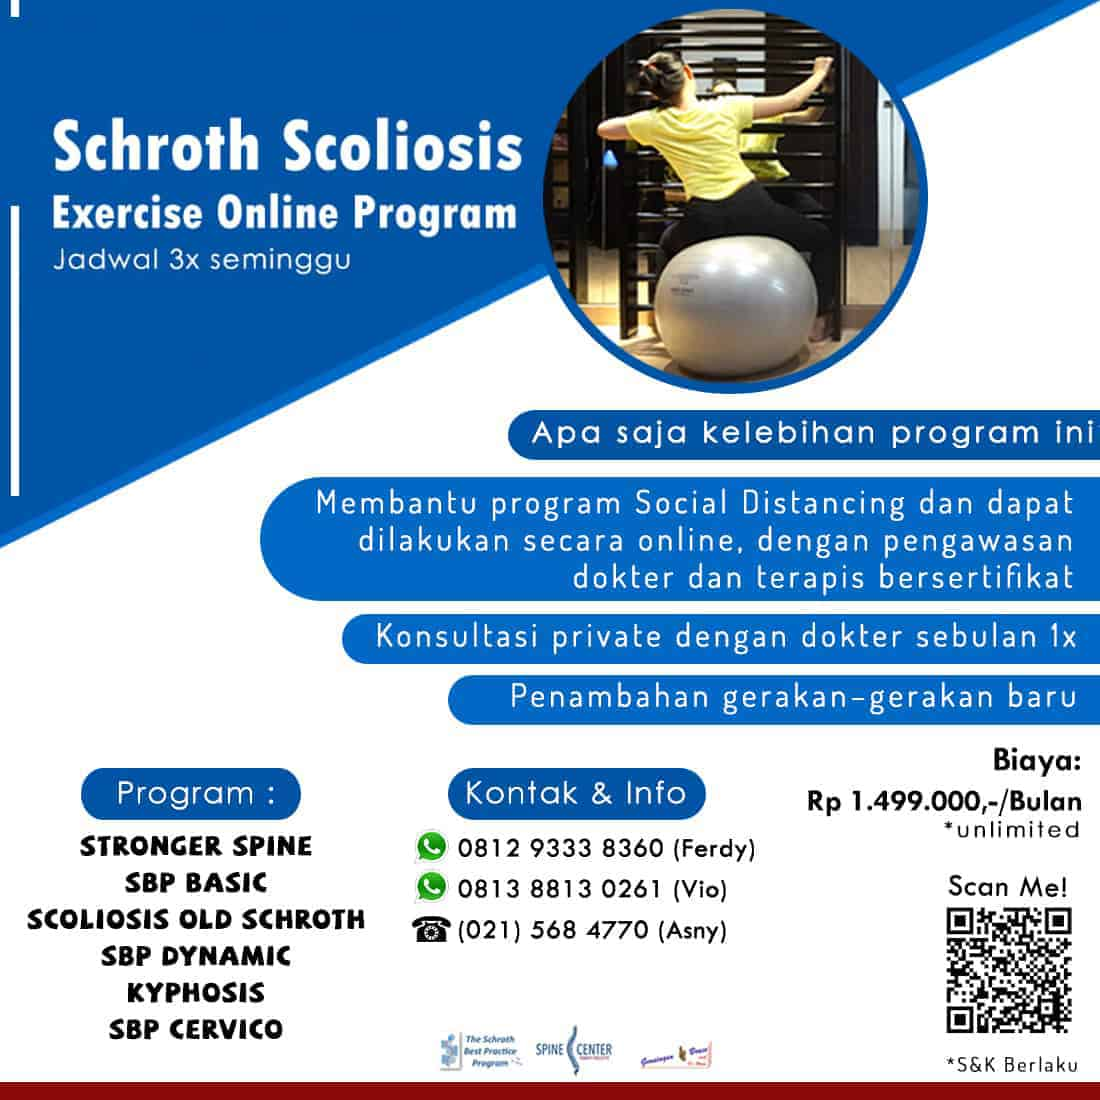 terapi skoliosis online